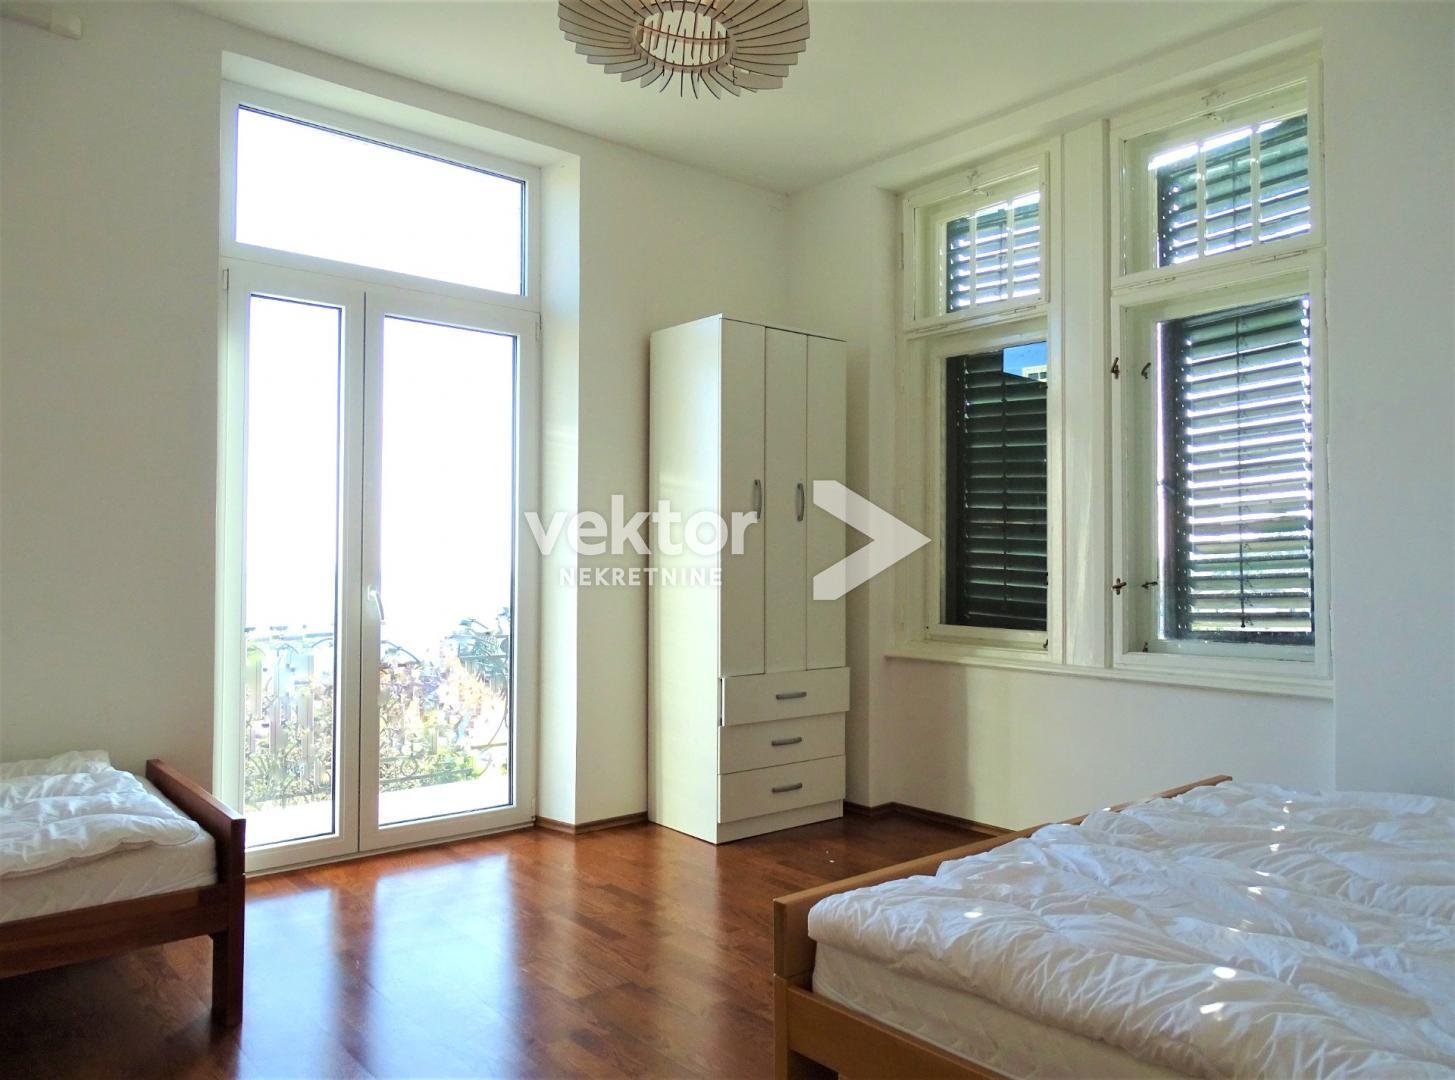 Stan, Opatija, 110m2, 4-soban, dva balkona